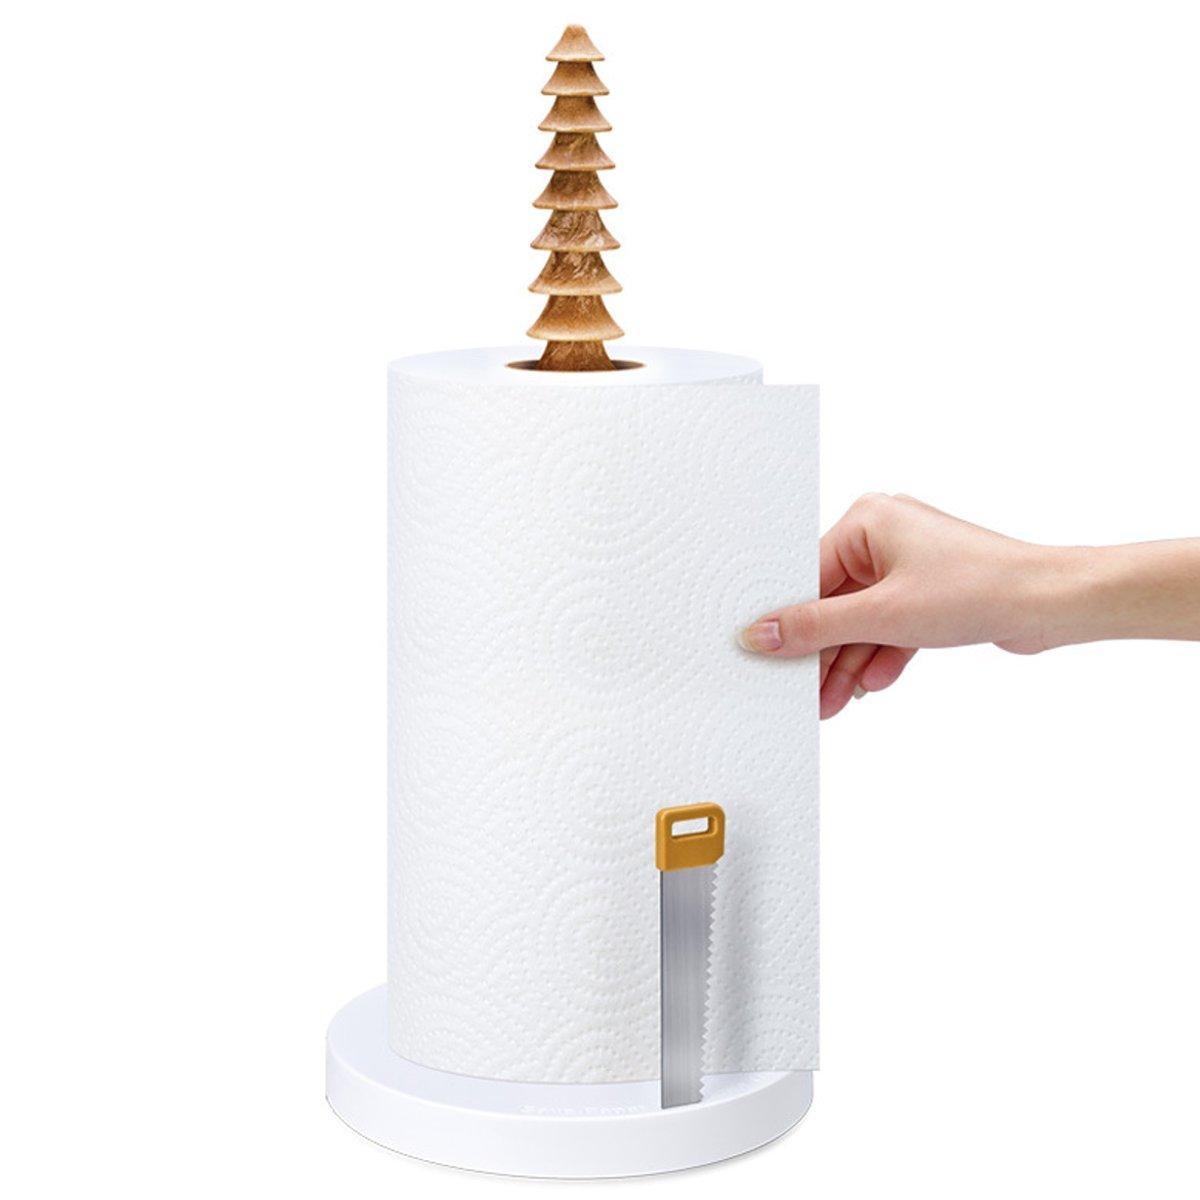 Keuken Keukenrolhouder Vrijstaand toiletpapier Roll Dispenser Opslag - 2